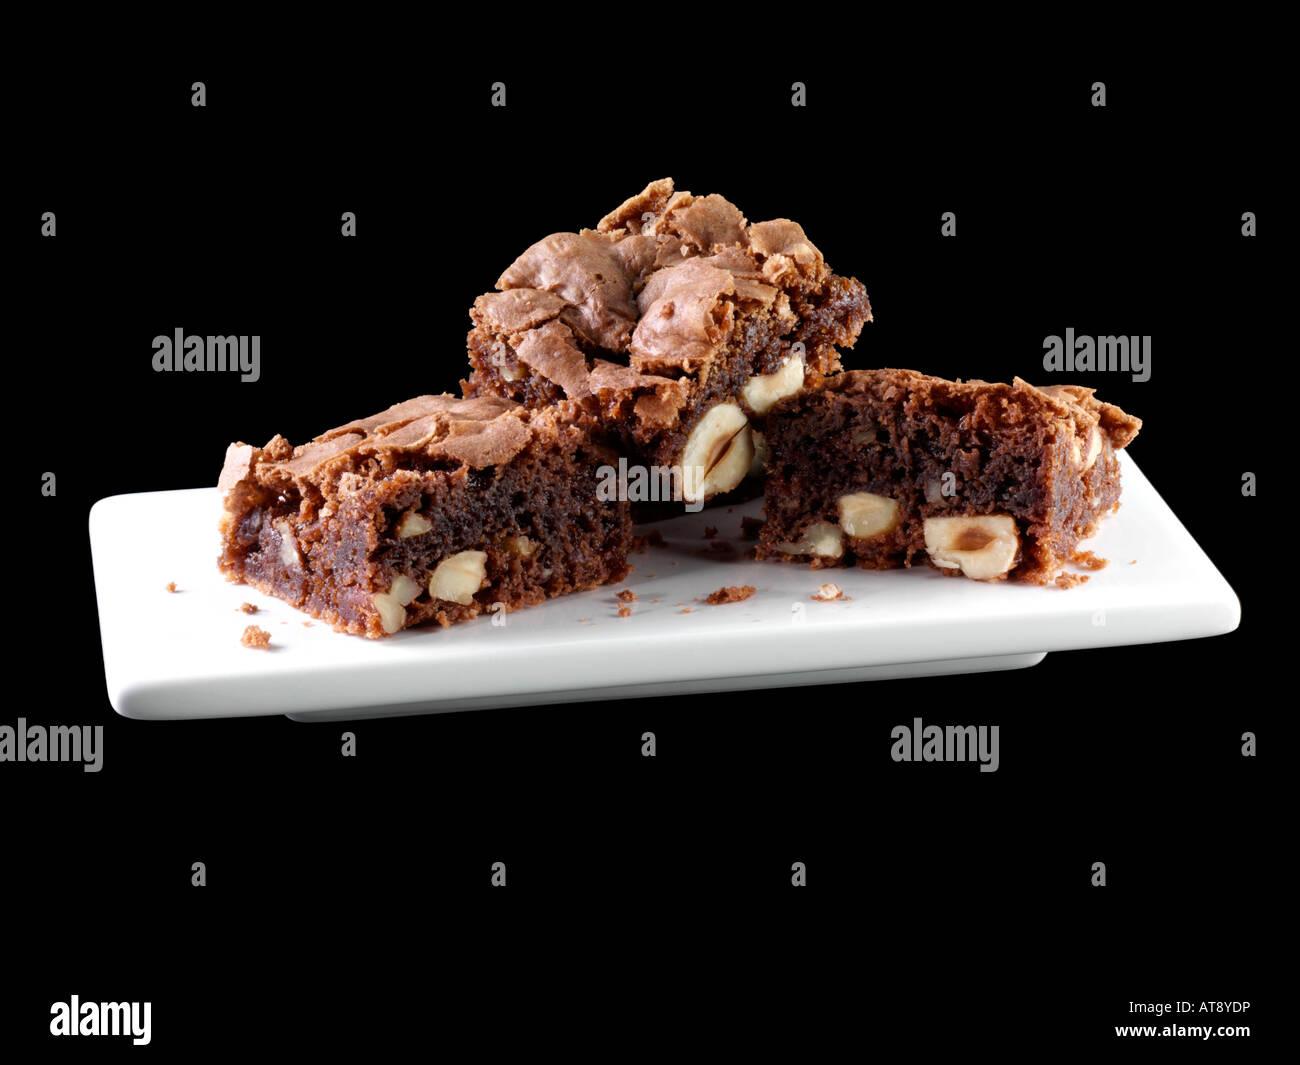 American chocolate brownies editorial food - Stock Image